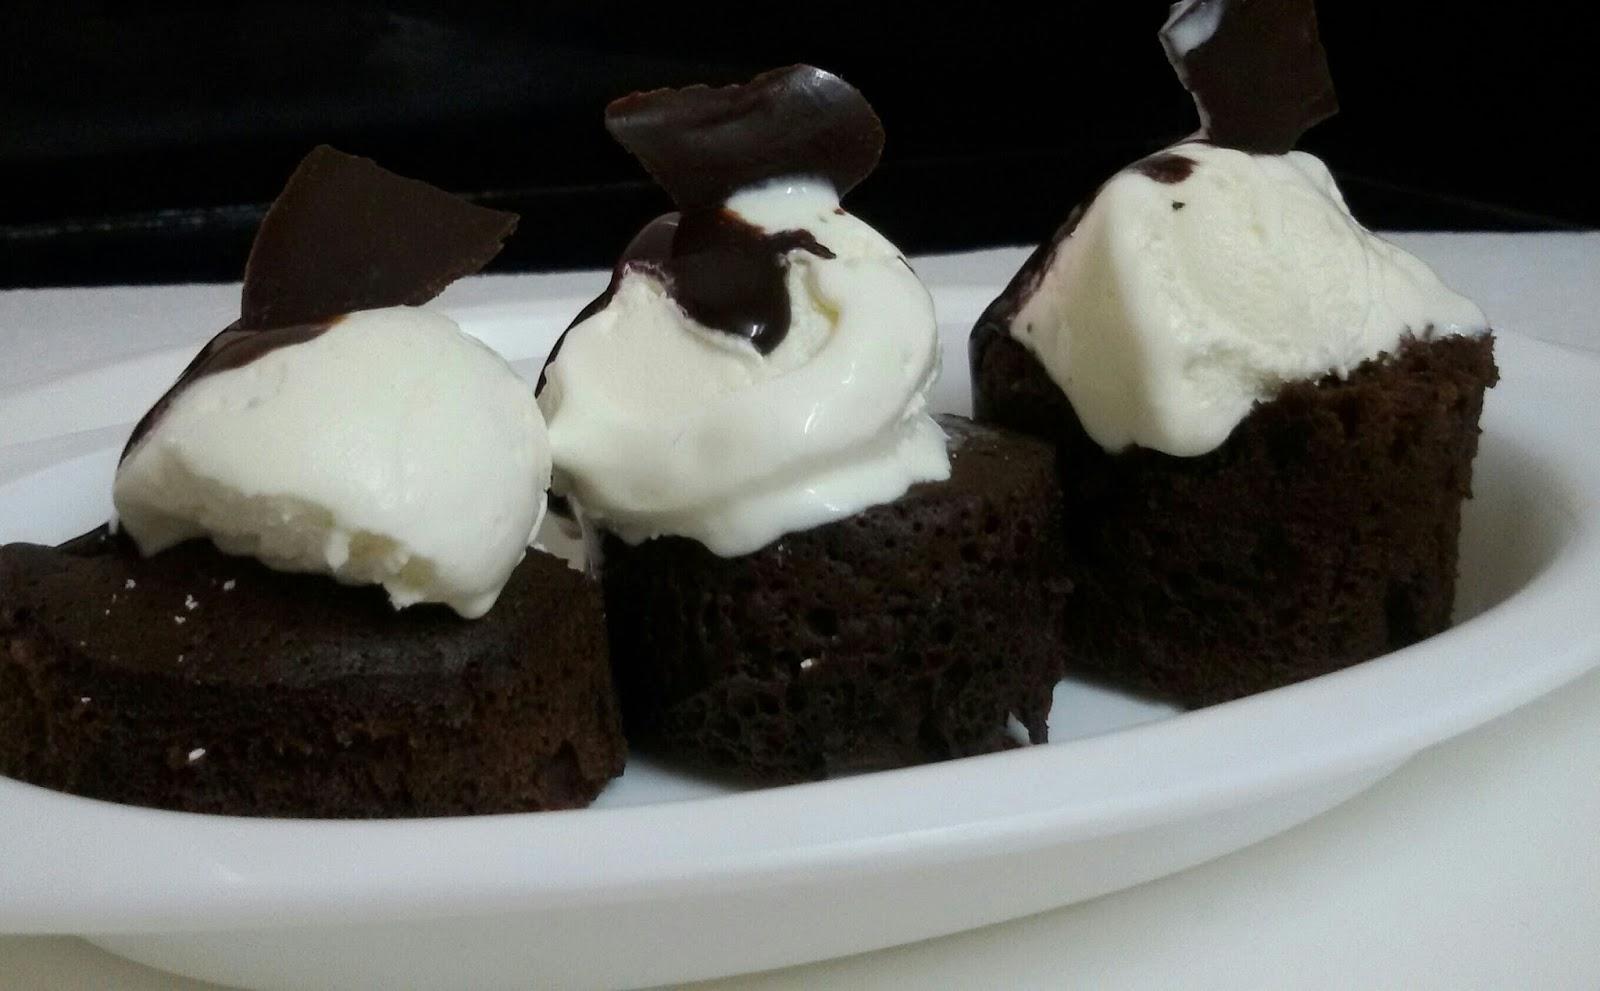 Microwave Cake Recipes In Bangla: Bongtaste : 3 MINUTES CHOCOLATE BROWNIE IN MICROWAVE